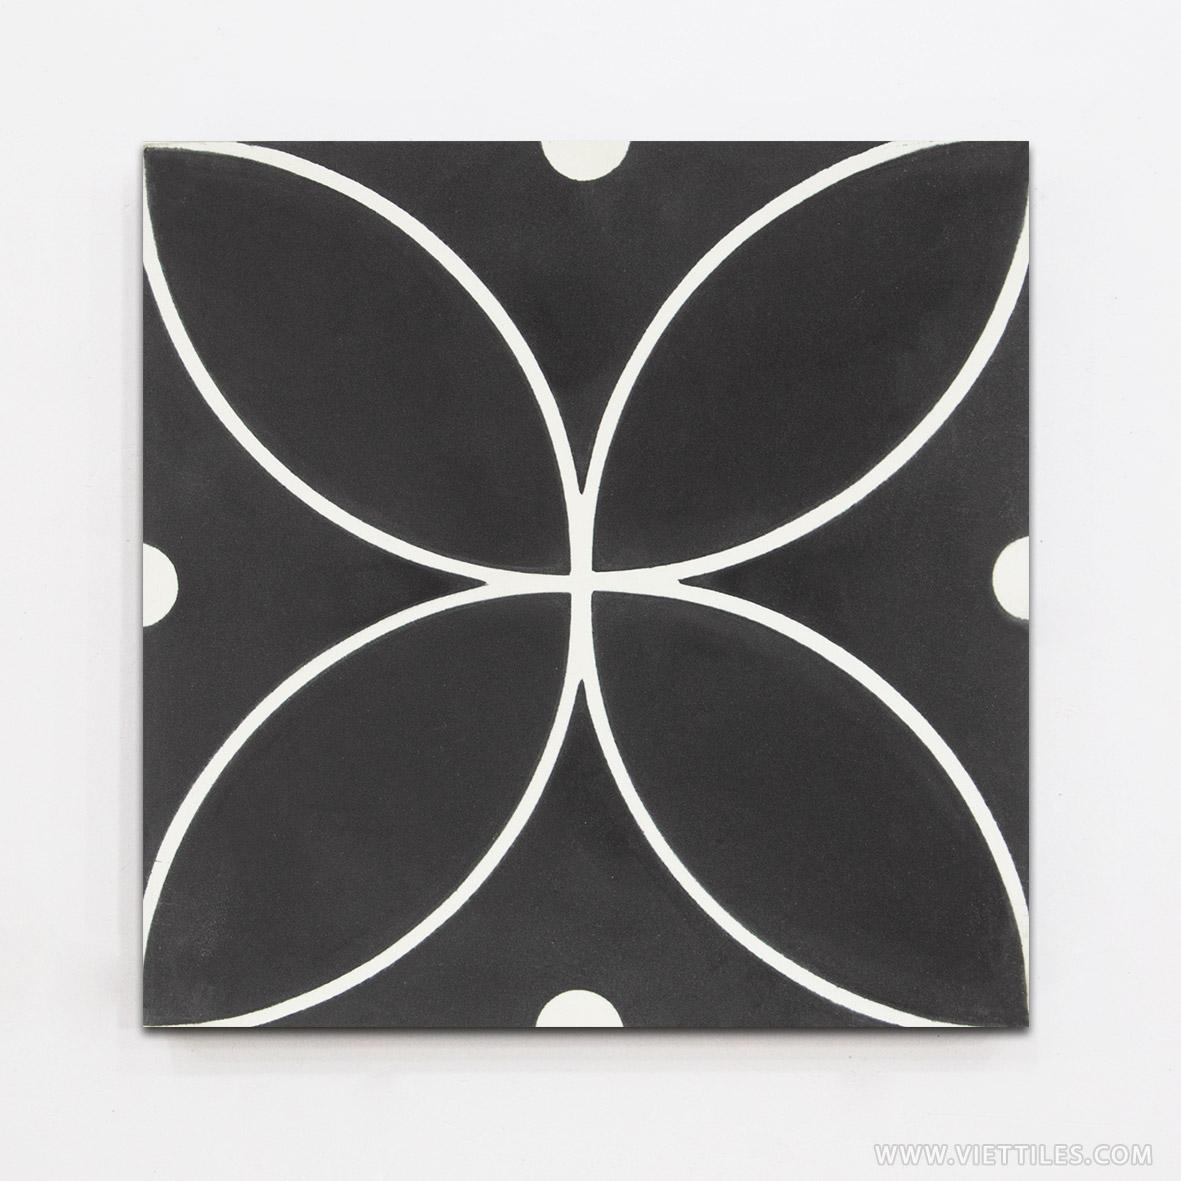 V20-1103 Cement Tile